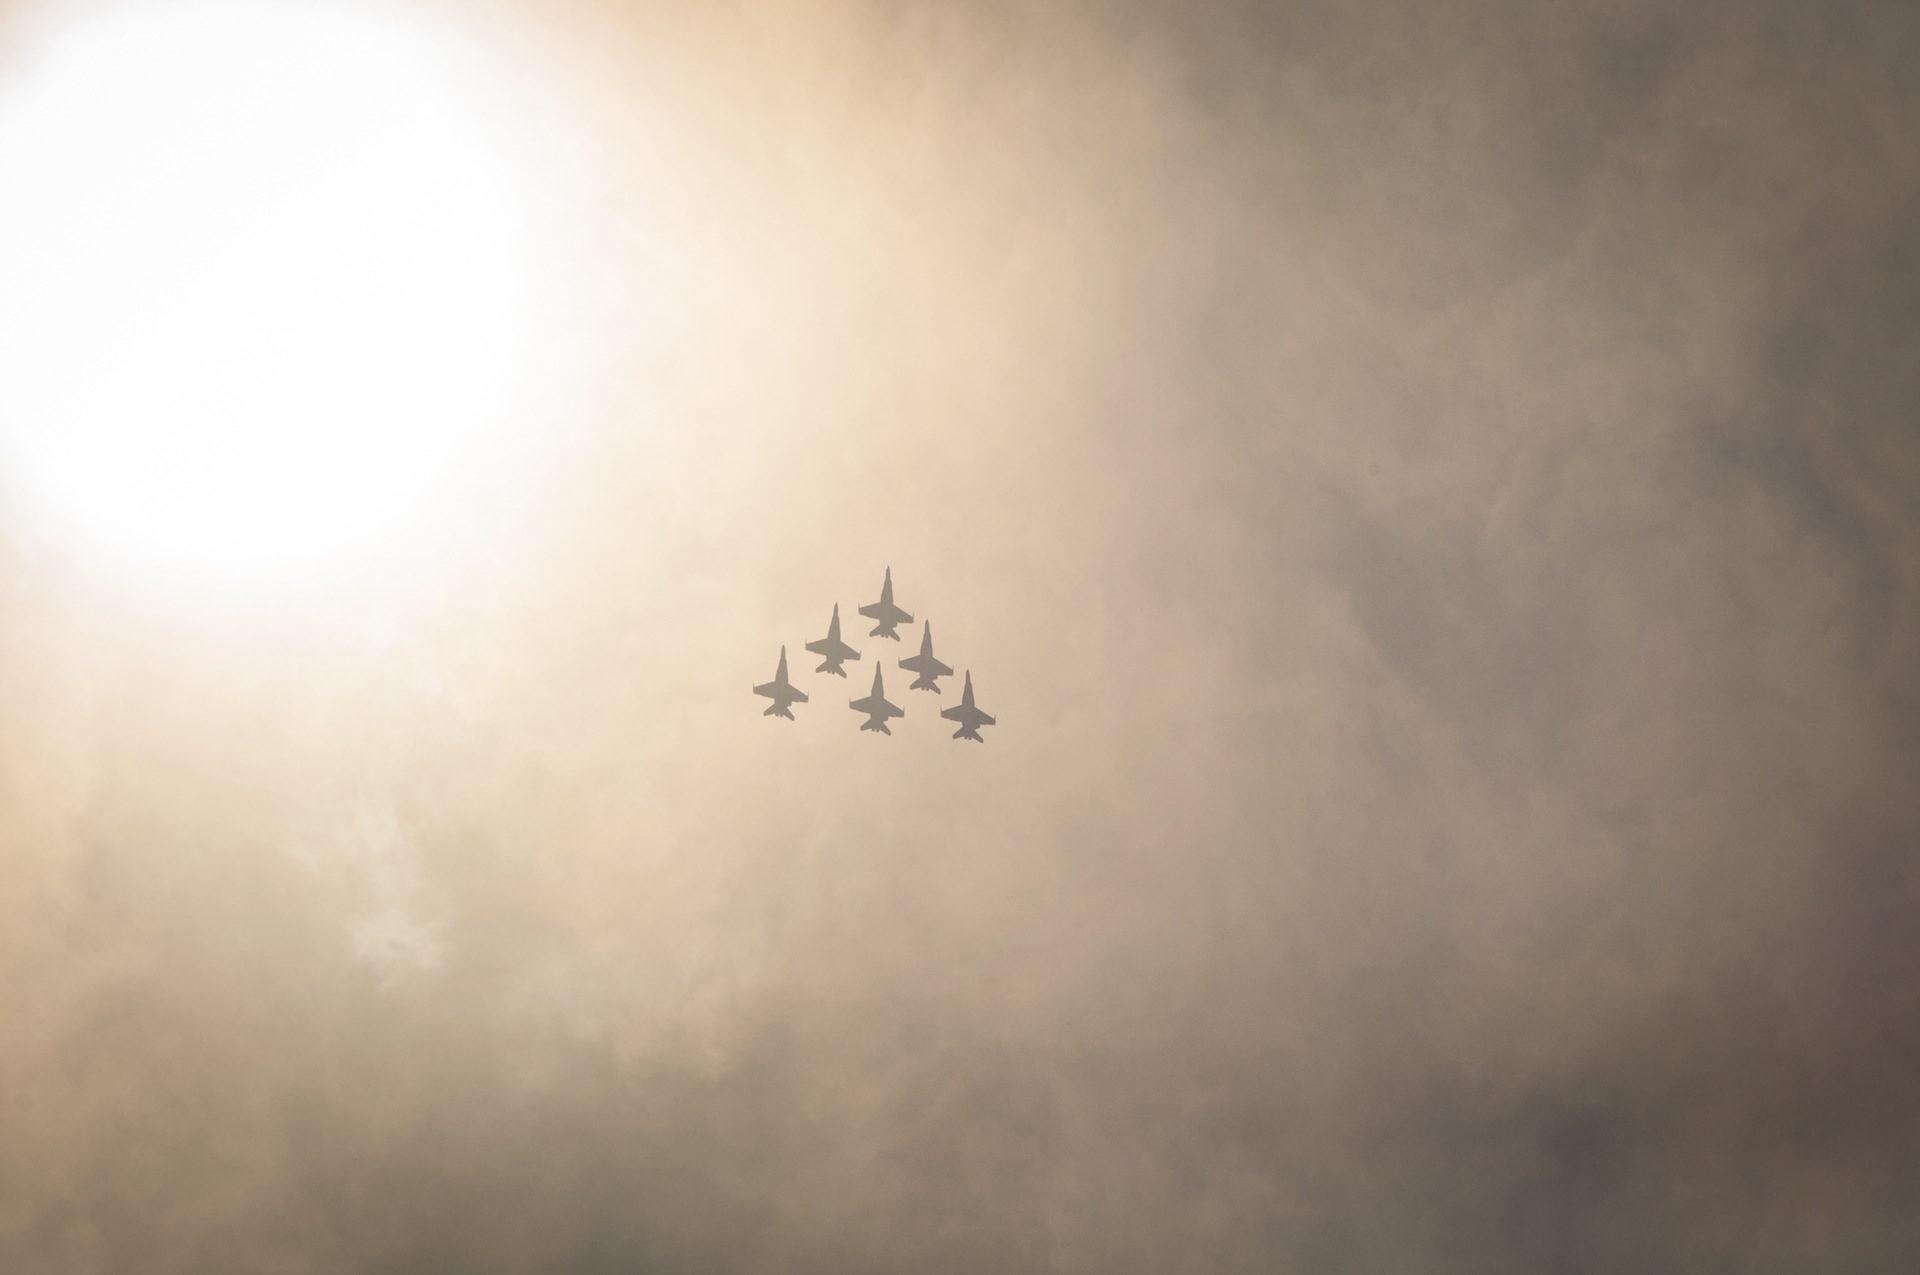 aviones, cazas, ejercito, aire, volar - Fondos de Pantalla HD - professor-falken.com